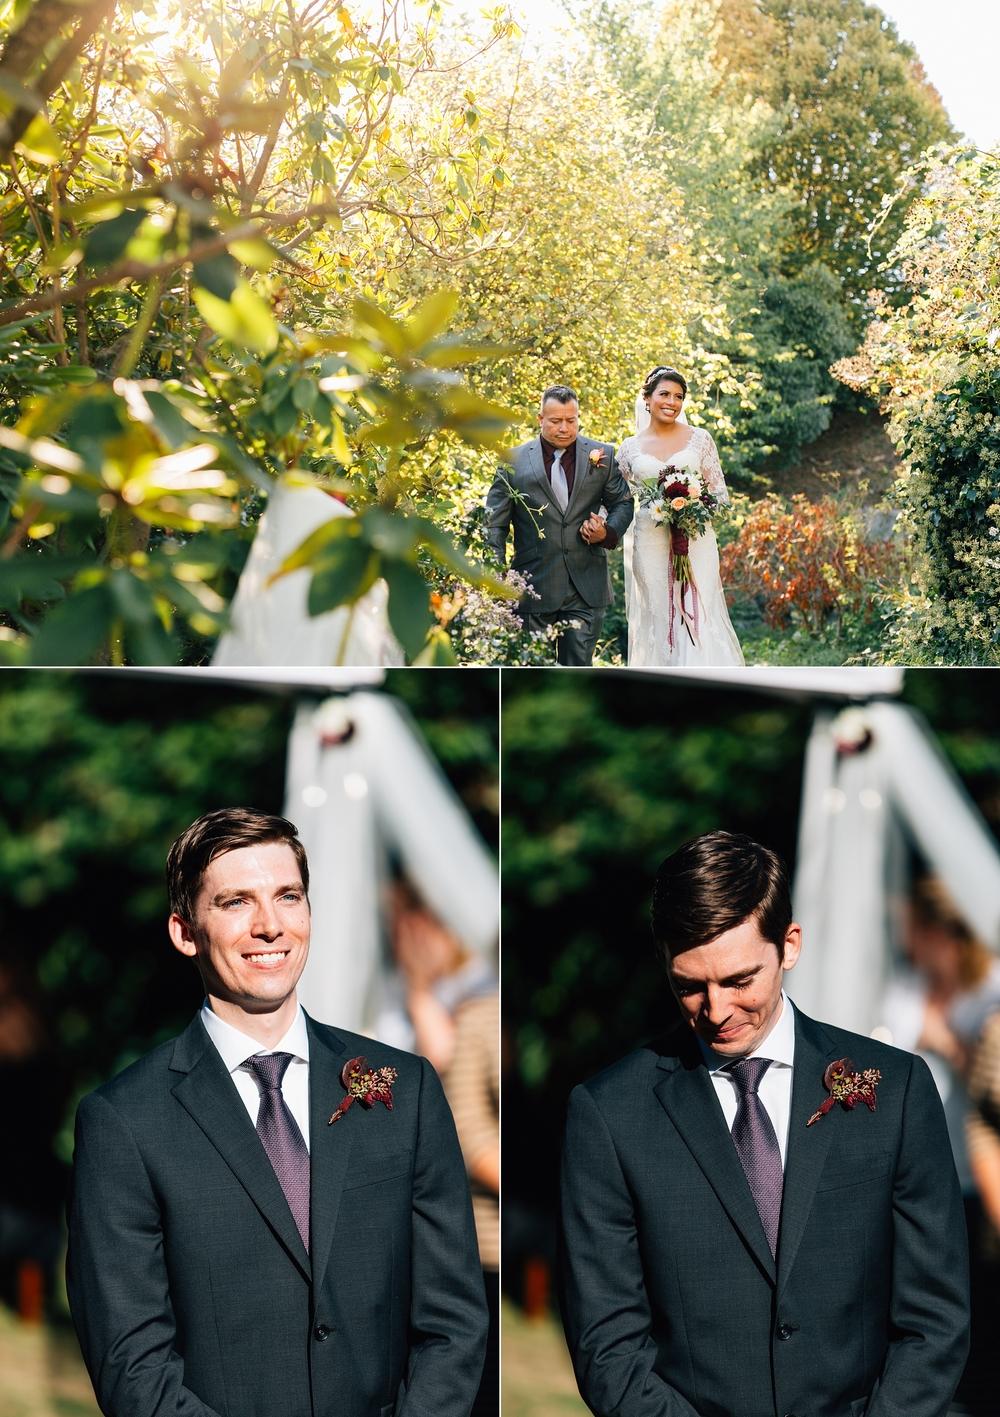 ashley vos photography seattle area wedding photographer_0802.jpg